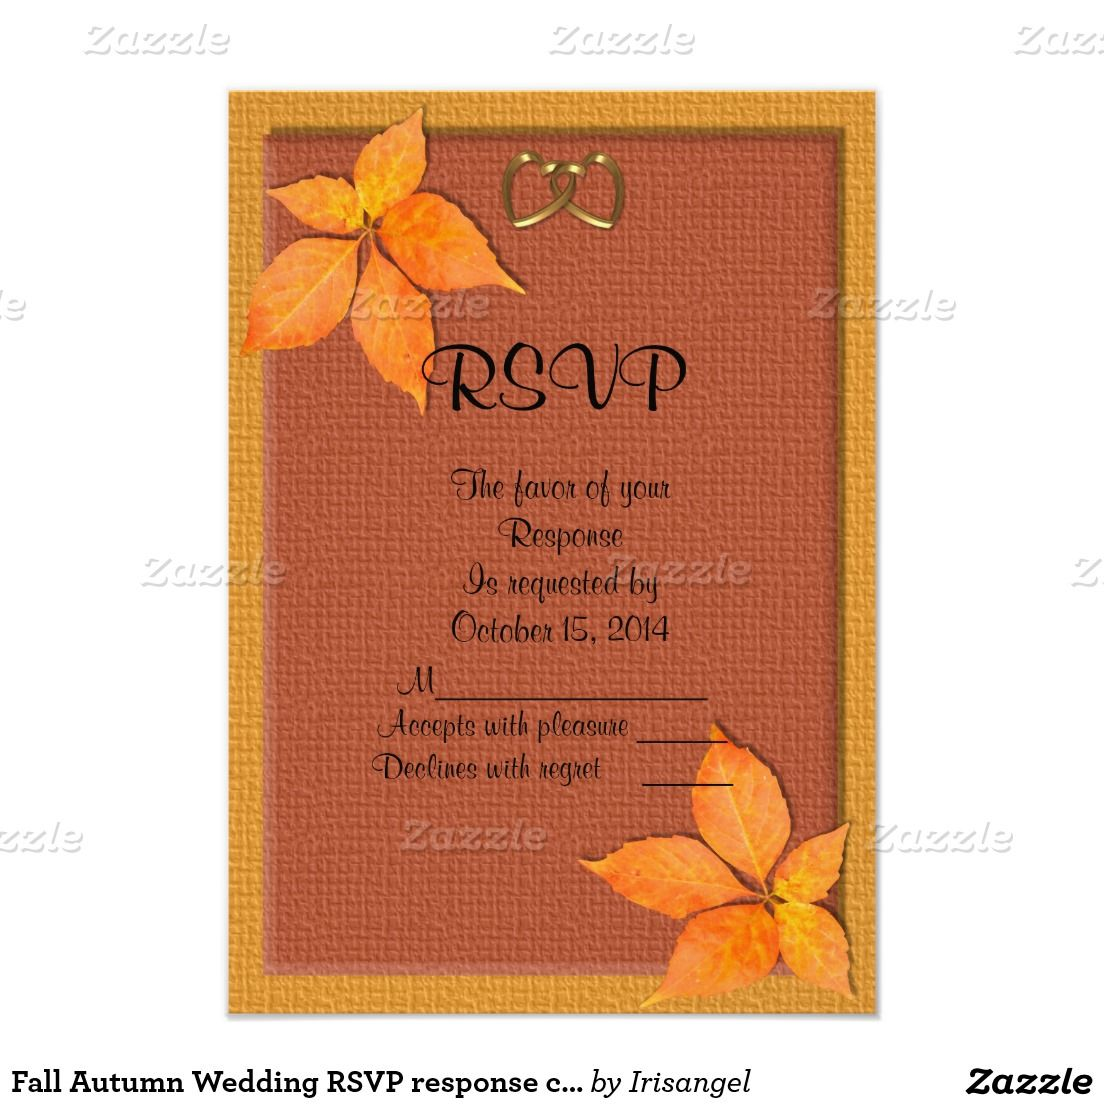 Fall Autumn Wedding RSVP response card | Response cards, Wedding ...